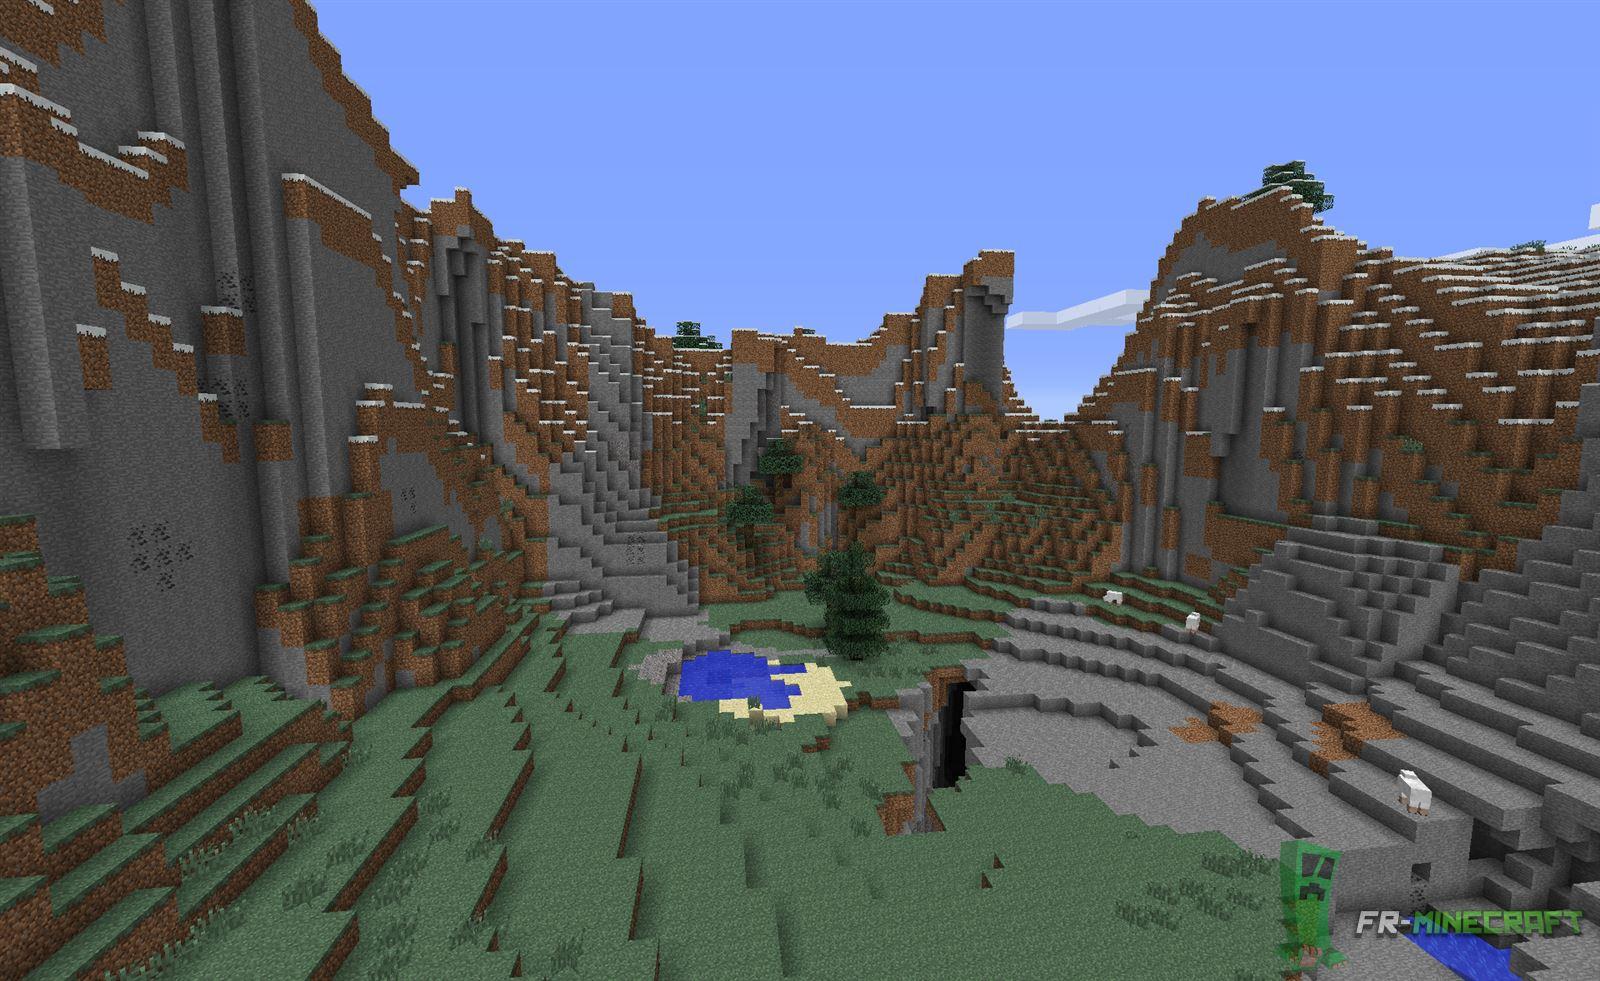 Minecraft Biome Montagnes